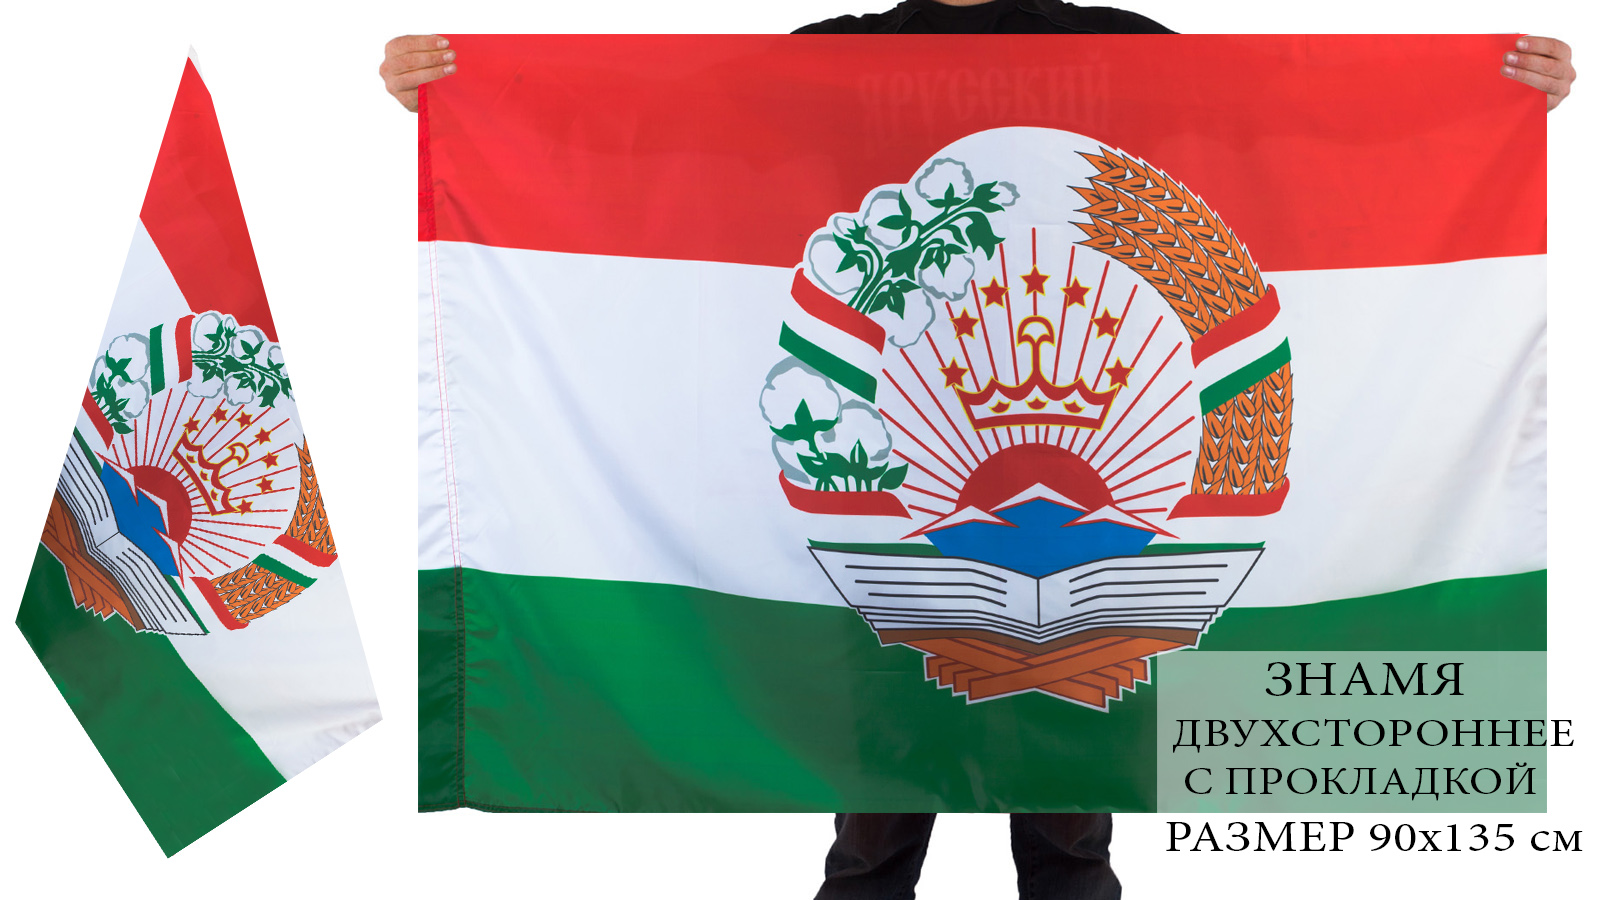 Государственный флаг Таджикистана двухсторонний с гербом